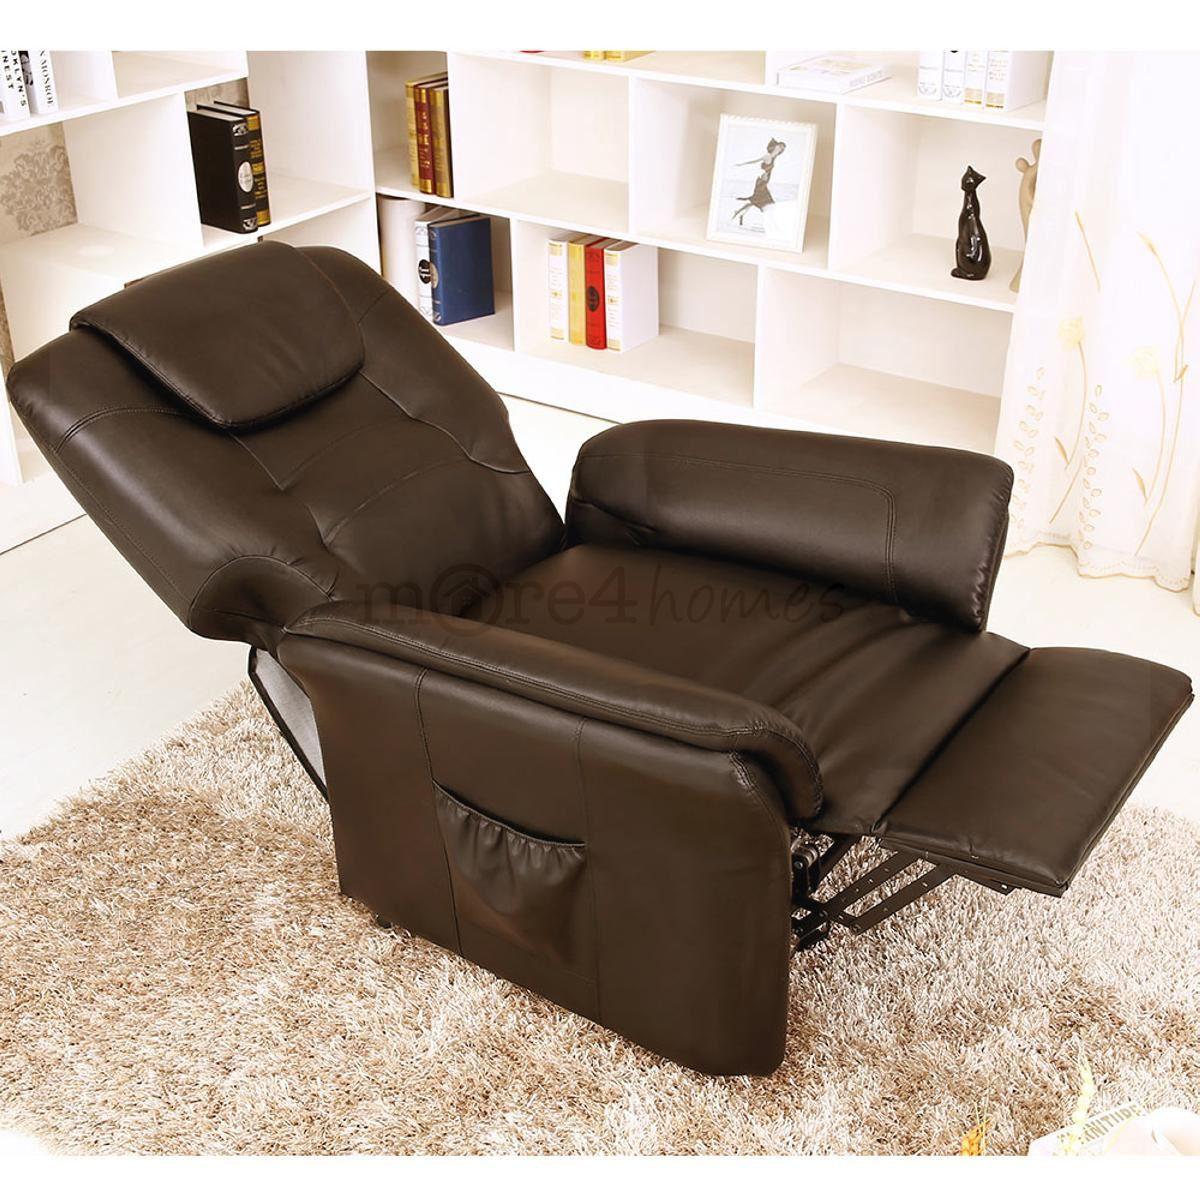 vine brown leather sofa ebay dexpen saddle set windsor electric rise recliner real armchair